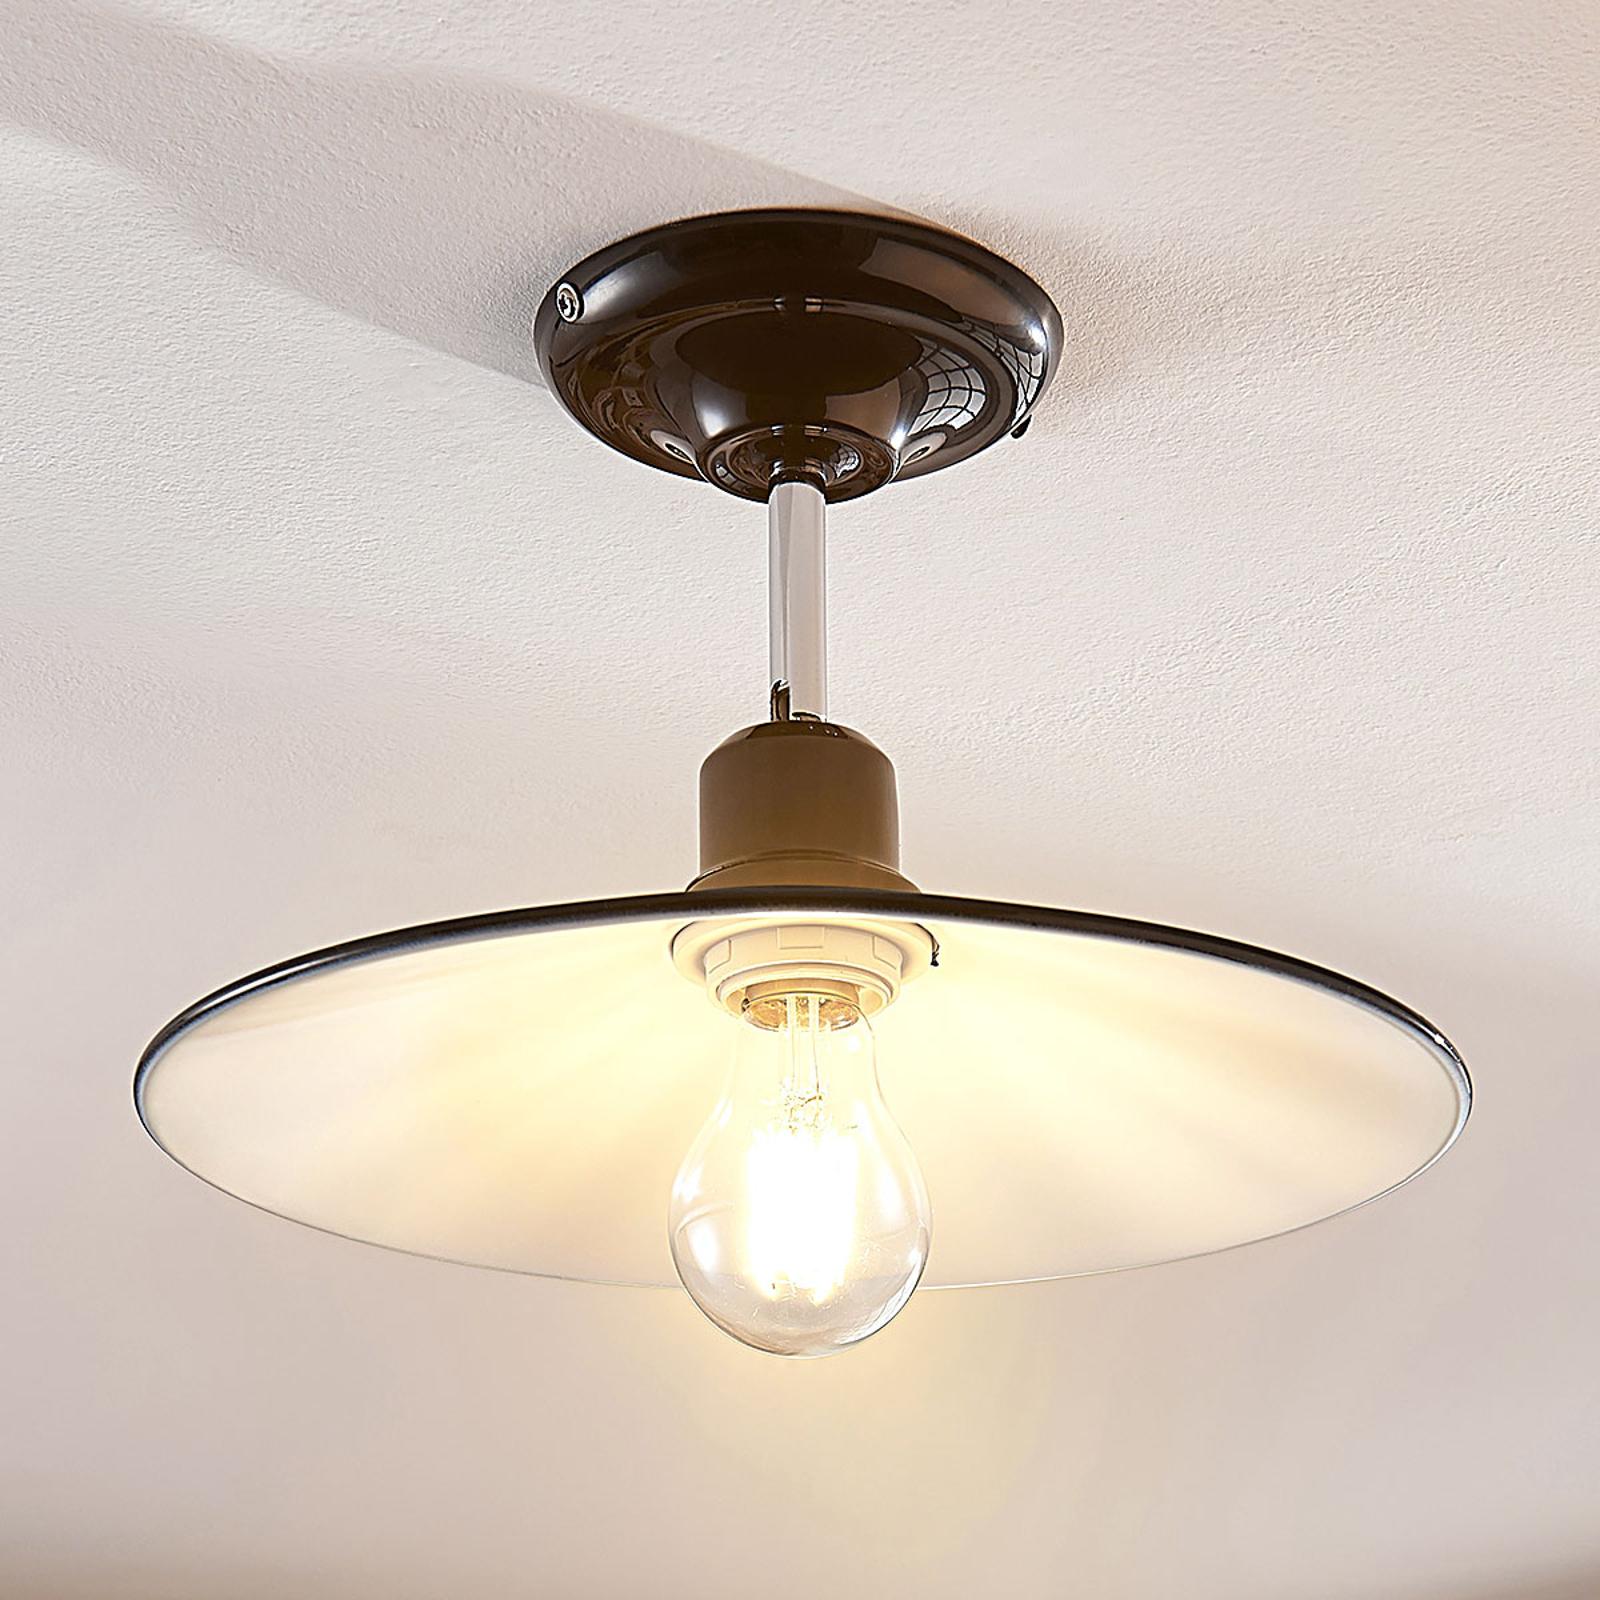 Czarna metalowa lampa sufitowa Phinea, vintage